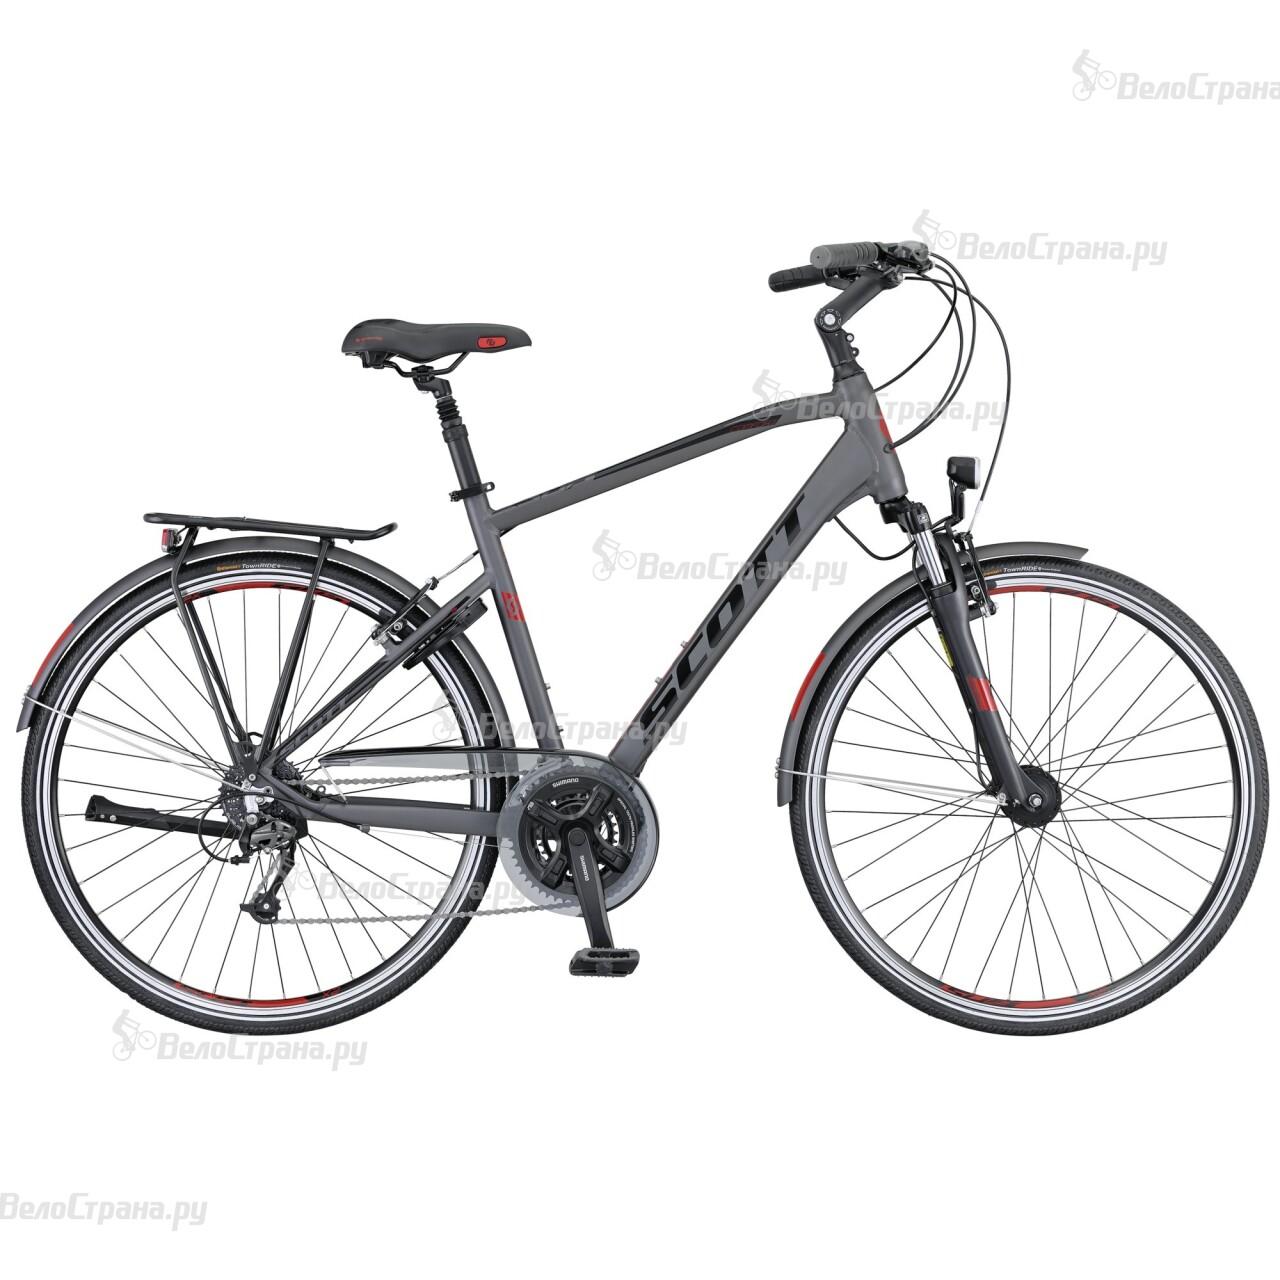 Велосипед Scott SUB Comfort 10 Men (2016) 2016 men